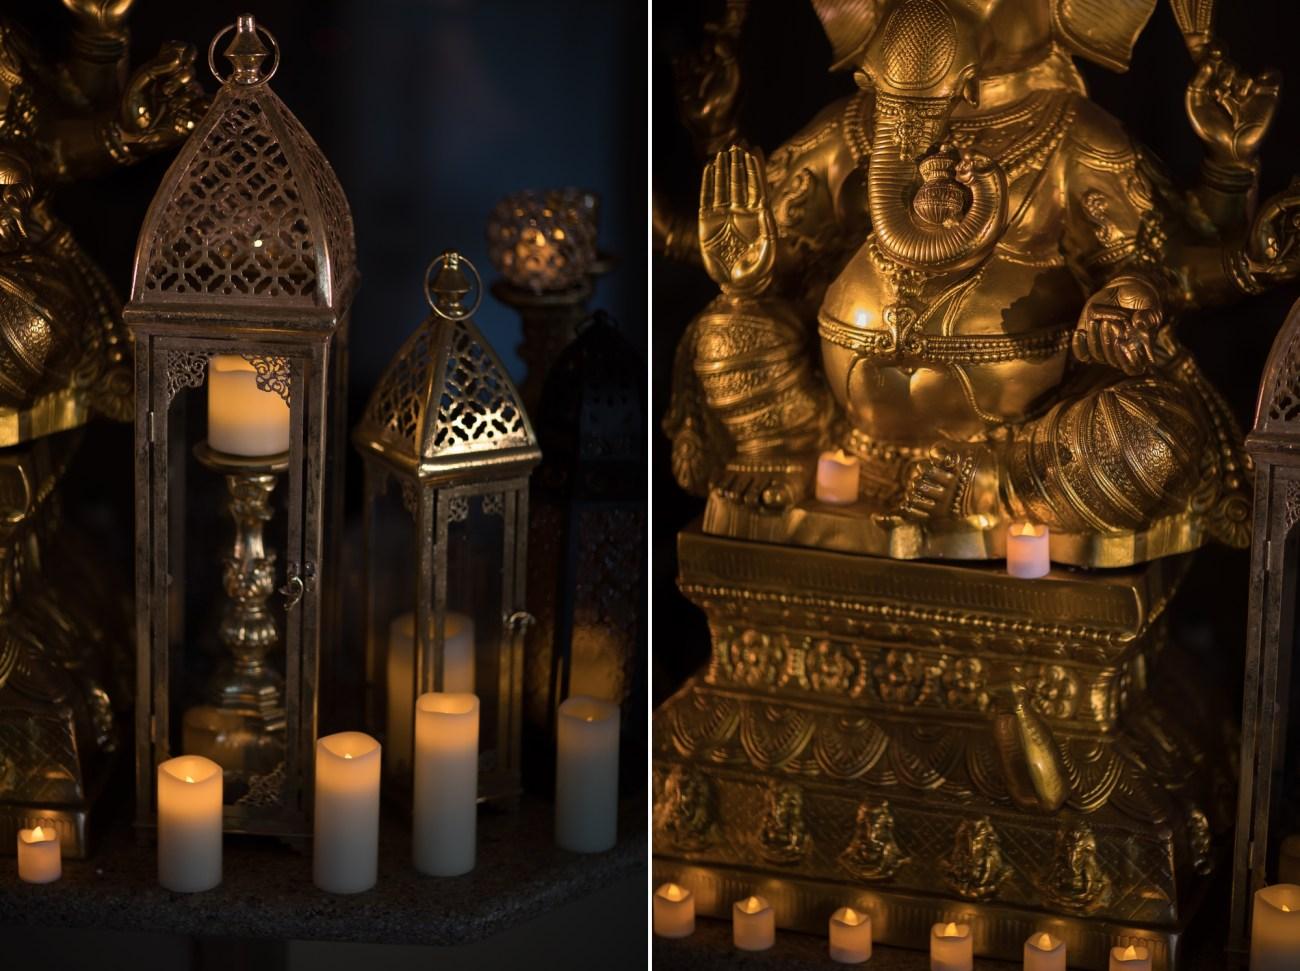 florida-indian-wedding-decorators-2 Indian Wedding Decoration in Florida | Ganesha Statue